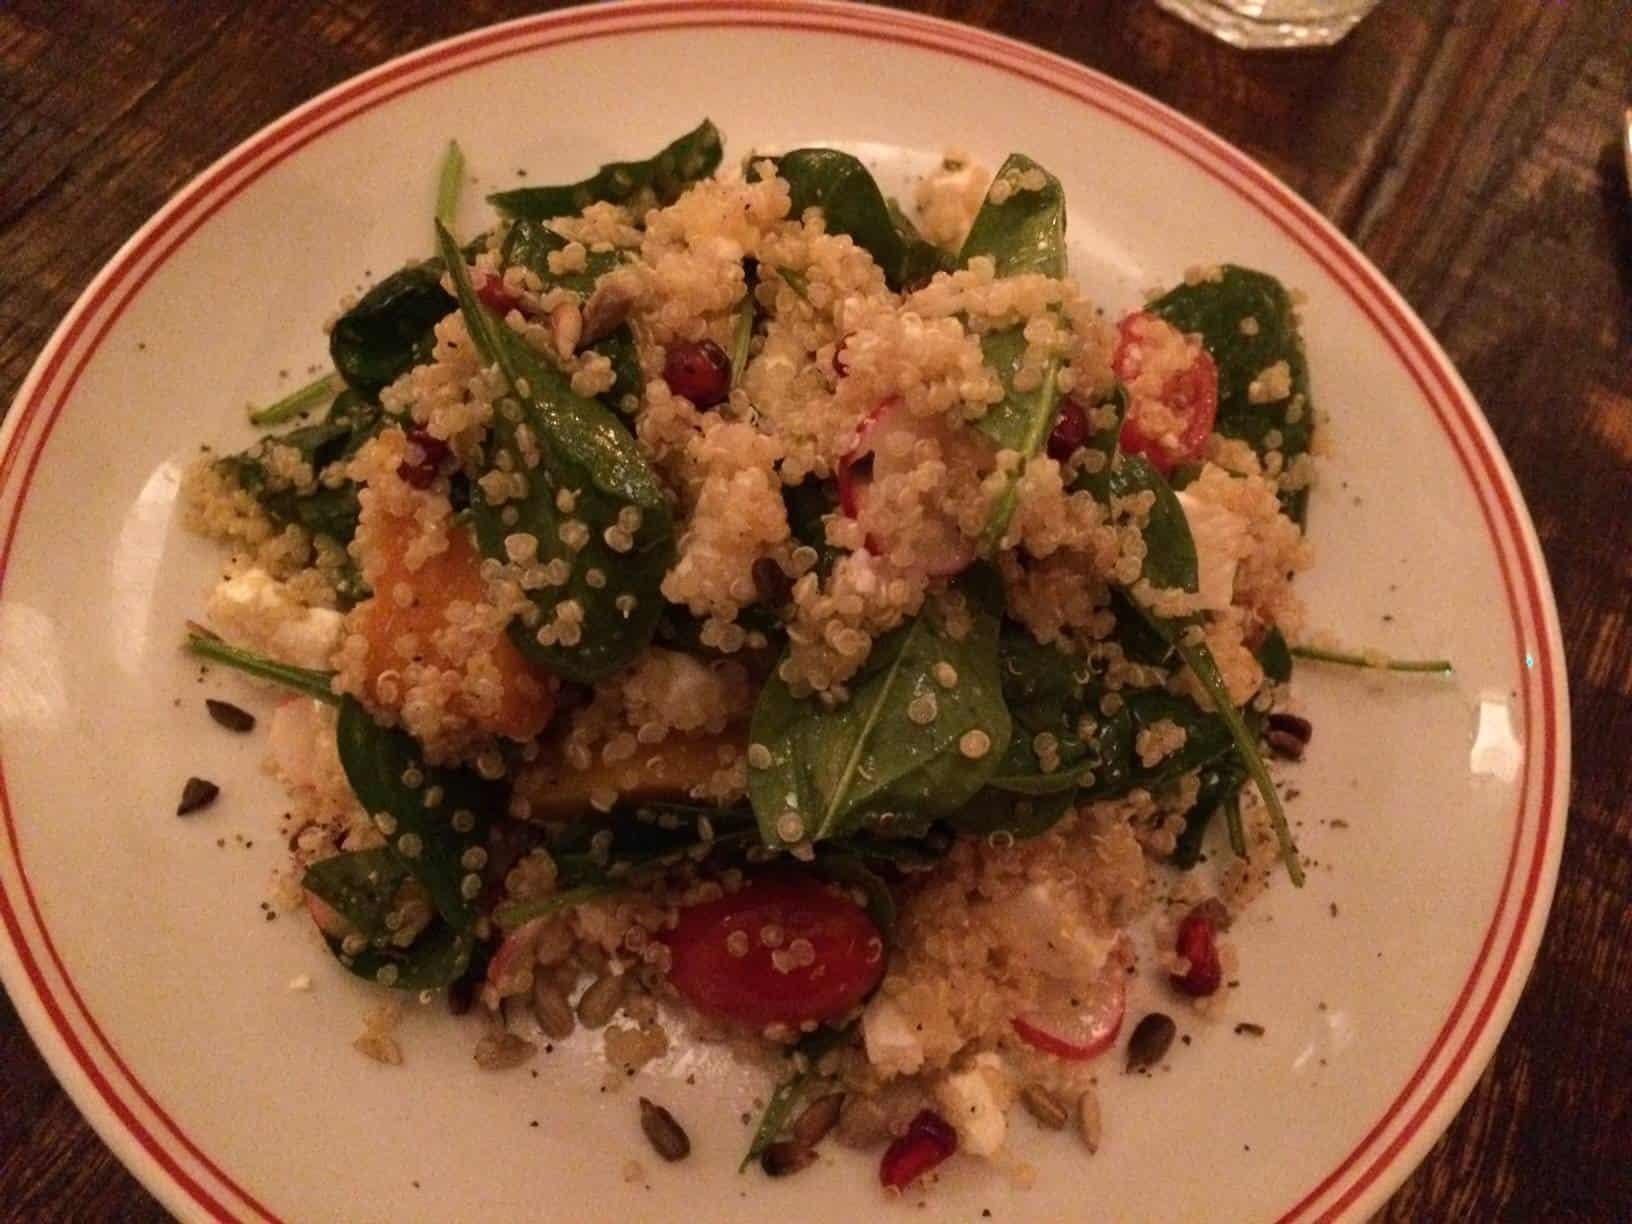 Quinoa salad starter